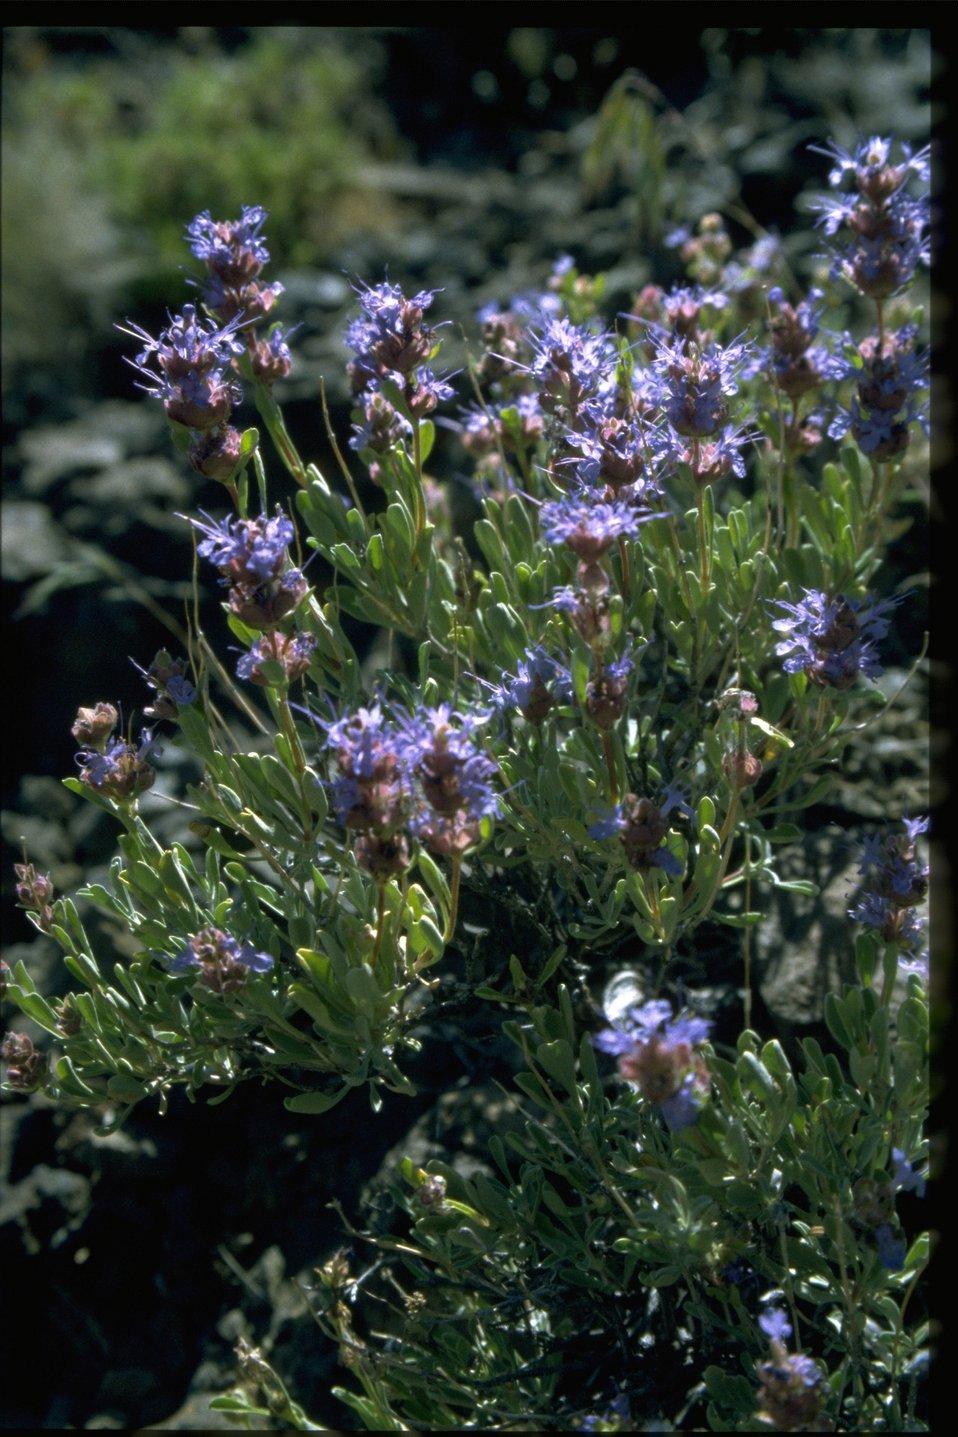 Medium shot of purple sage (Saliva dorrii).